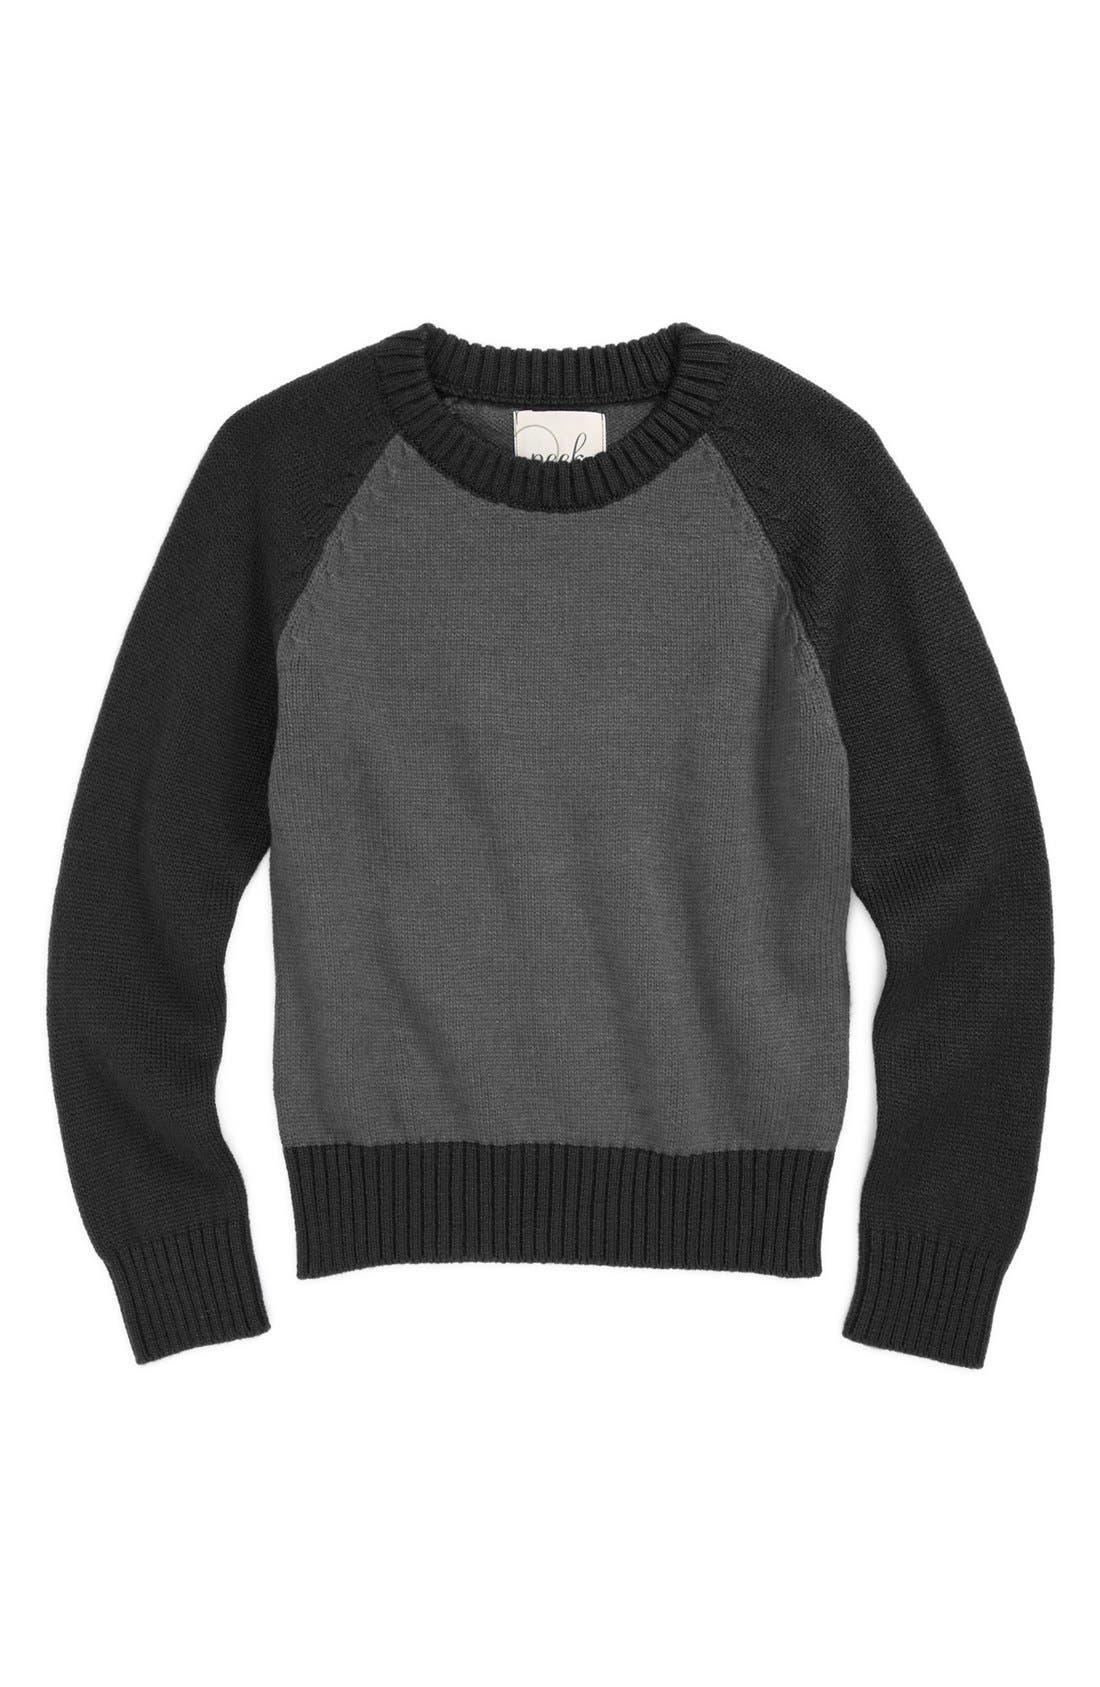 Alternate Image 1 Selected - Peek 'Clayton' Sweater (Toddler Boys, Little Boys & Big Boys)